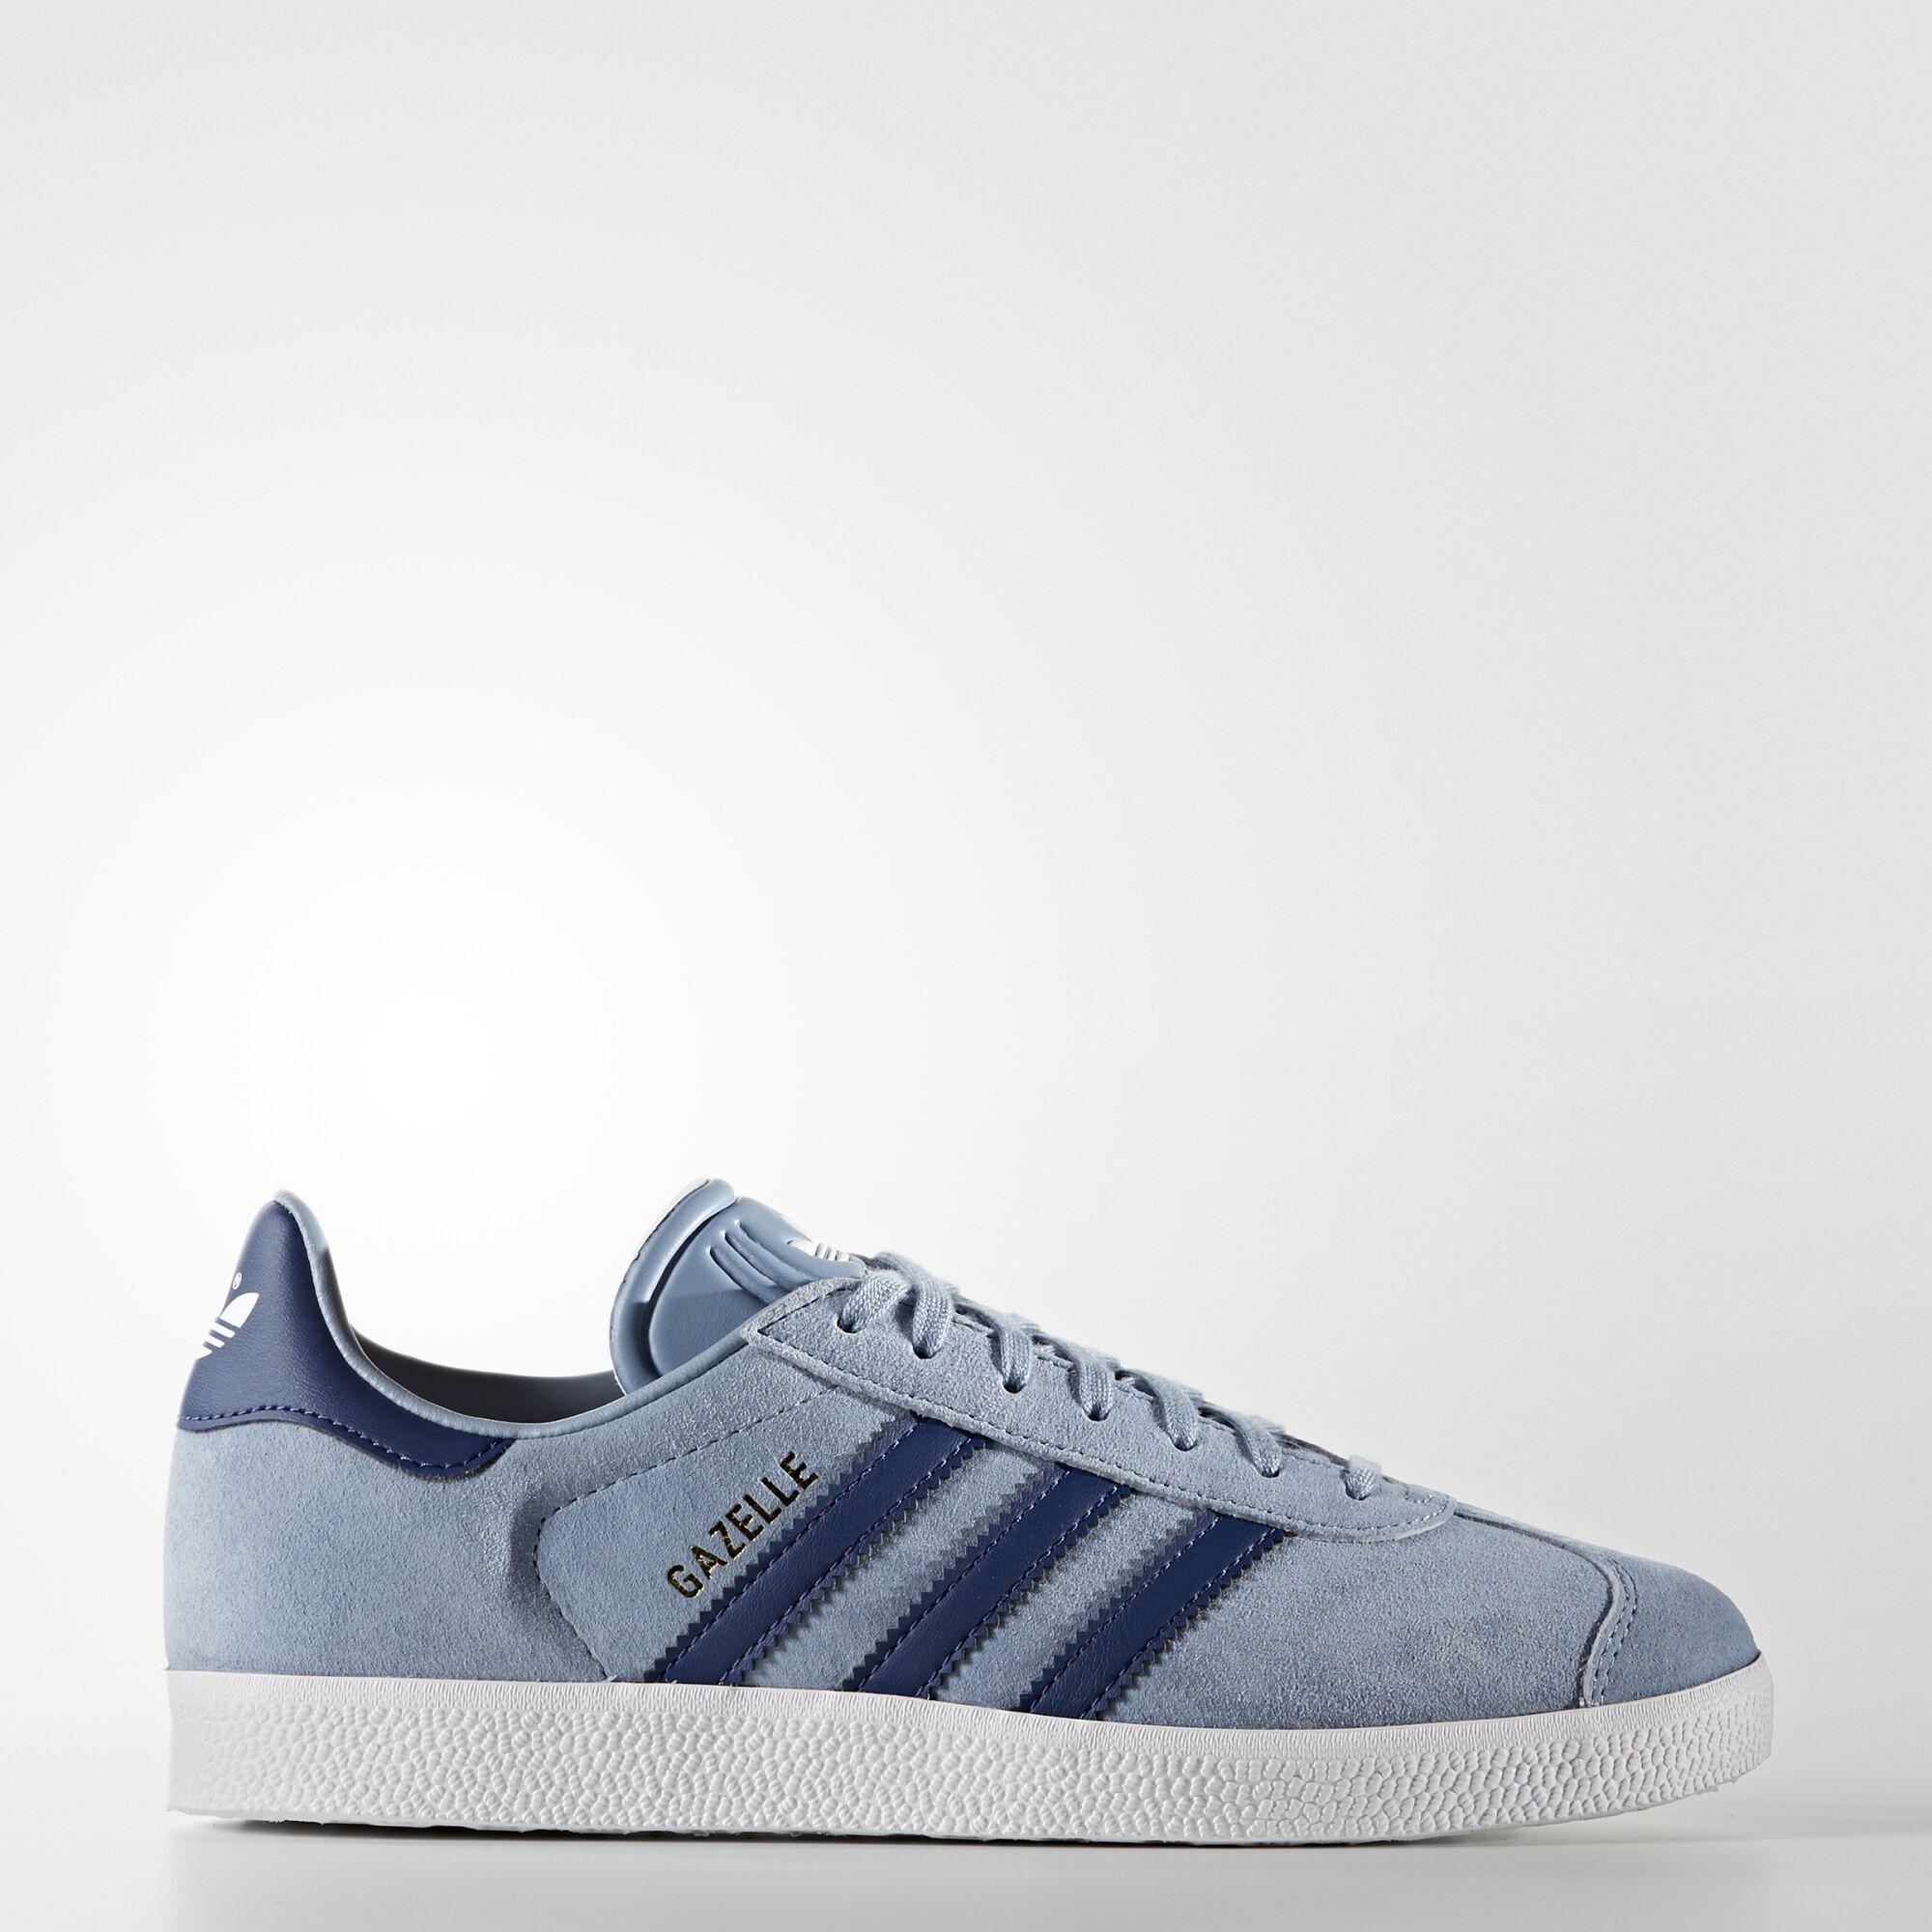 adidas gazelle blue leather